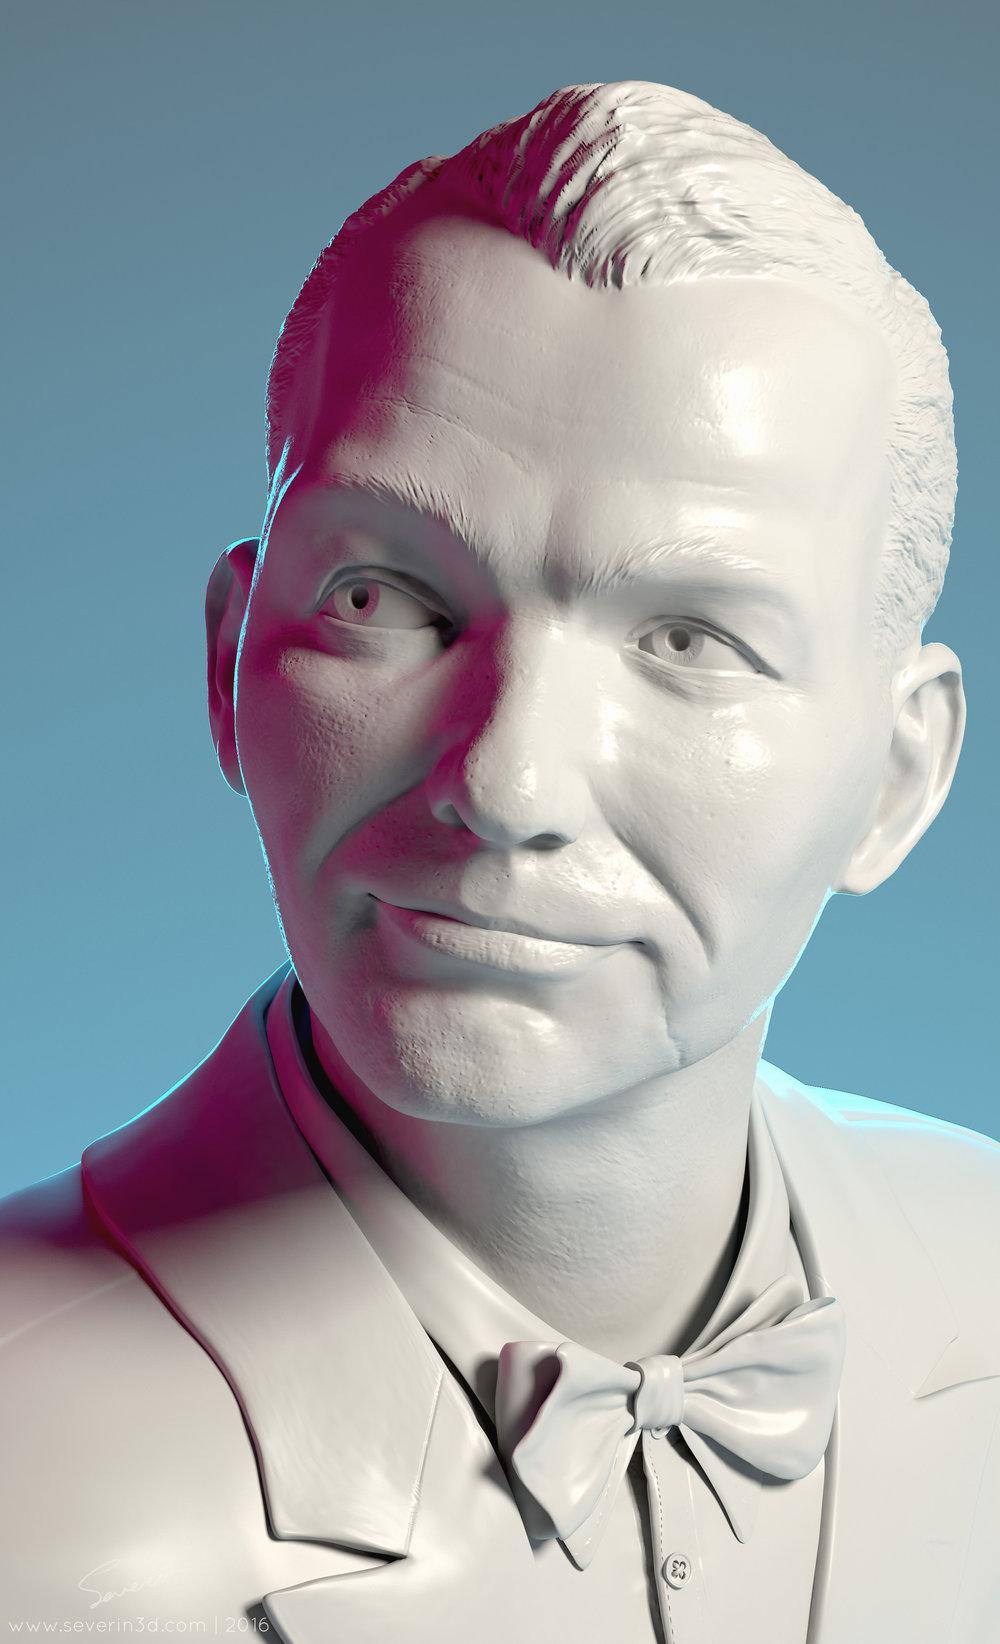 Frank Sinatra bust 3d render closeup with signature